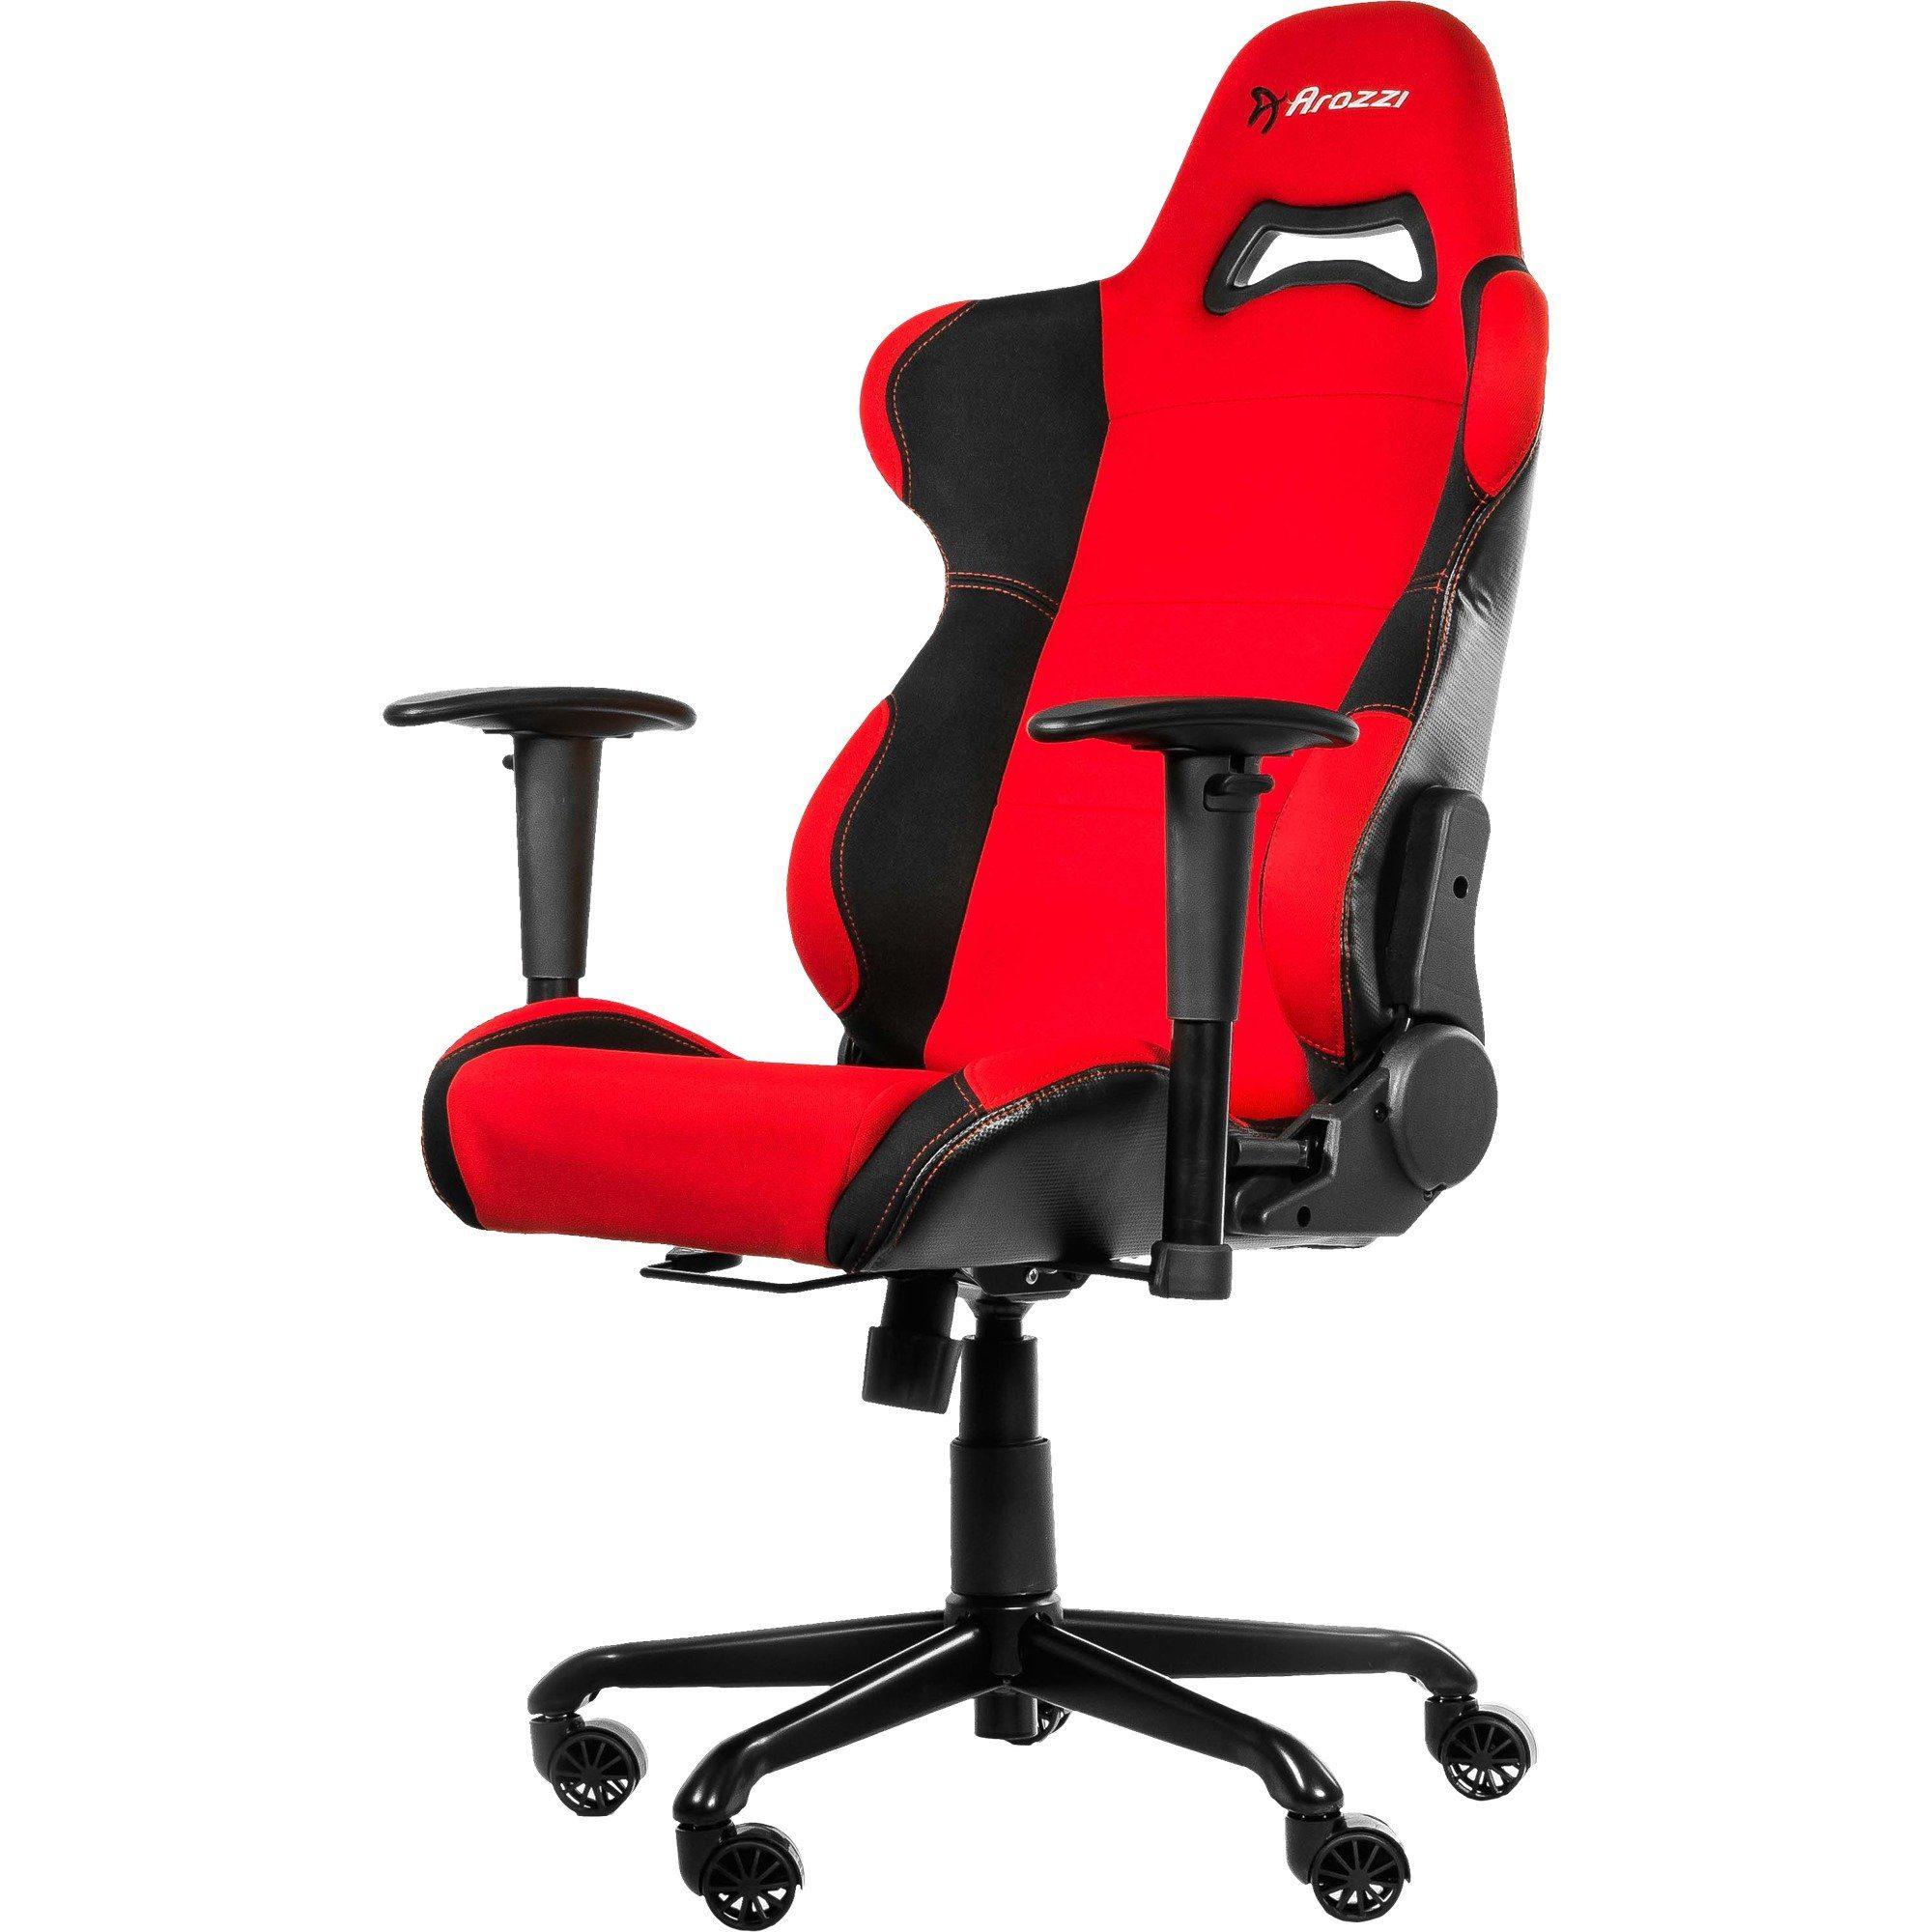 Arozzi Spielsitz »Torretta Gaming Chair«